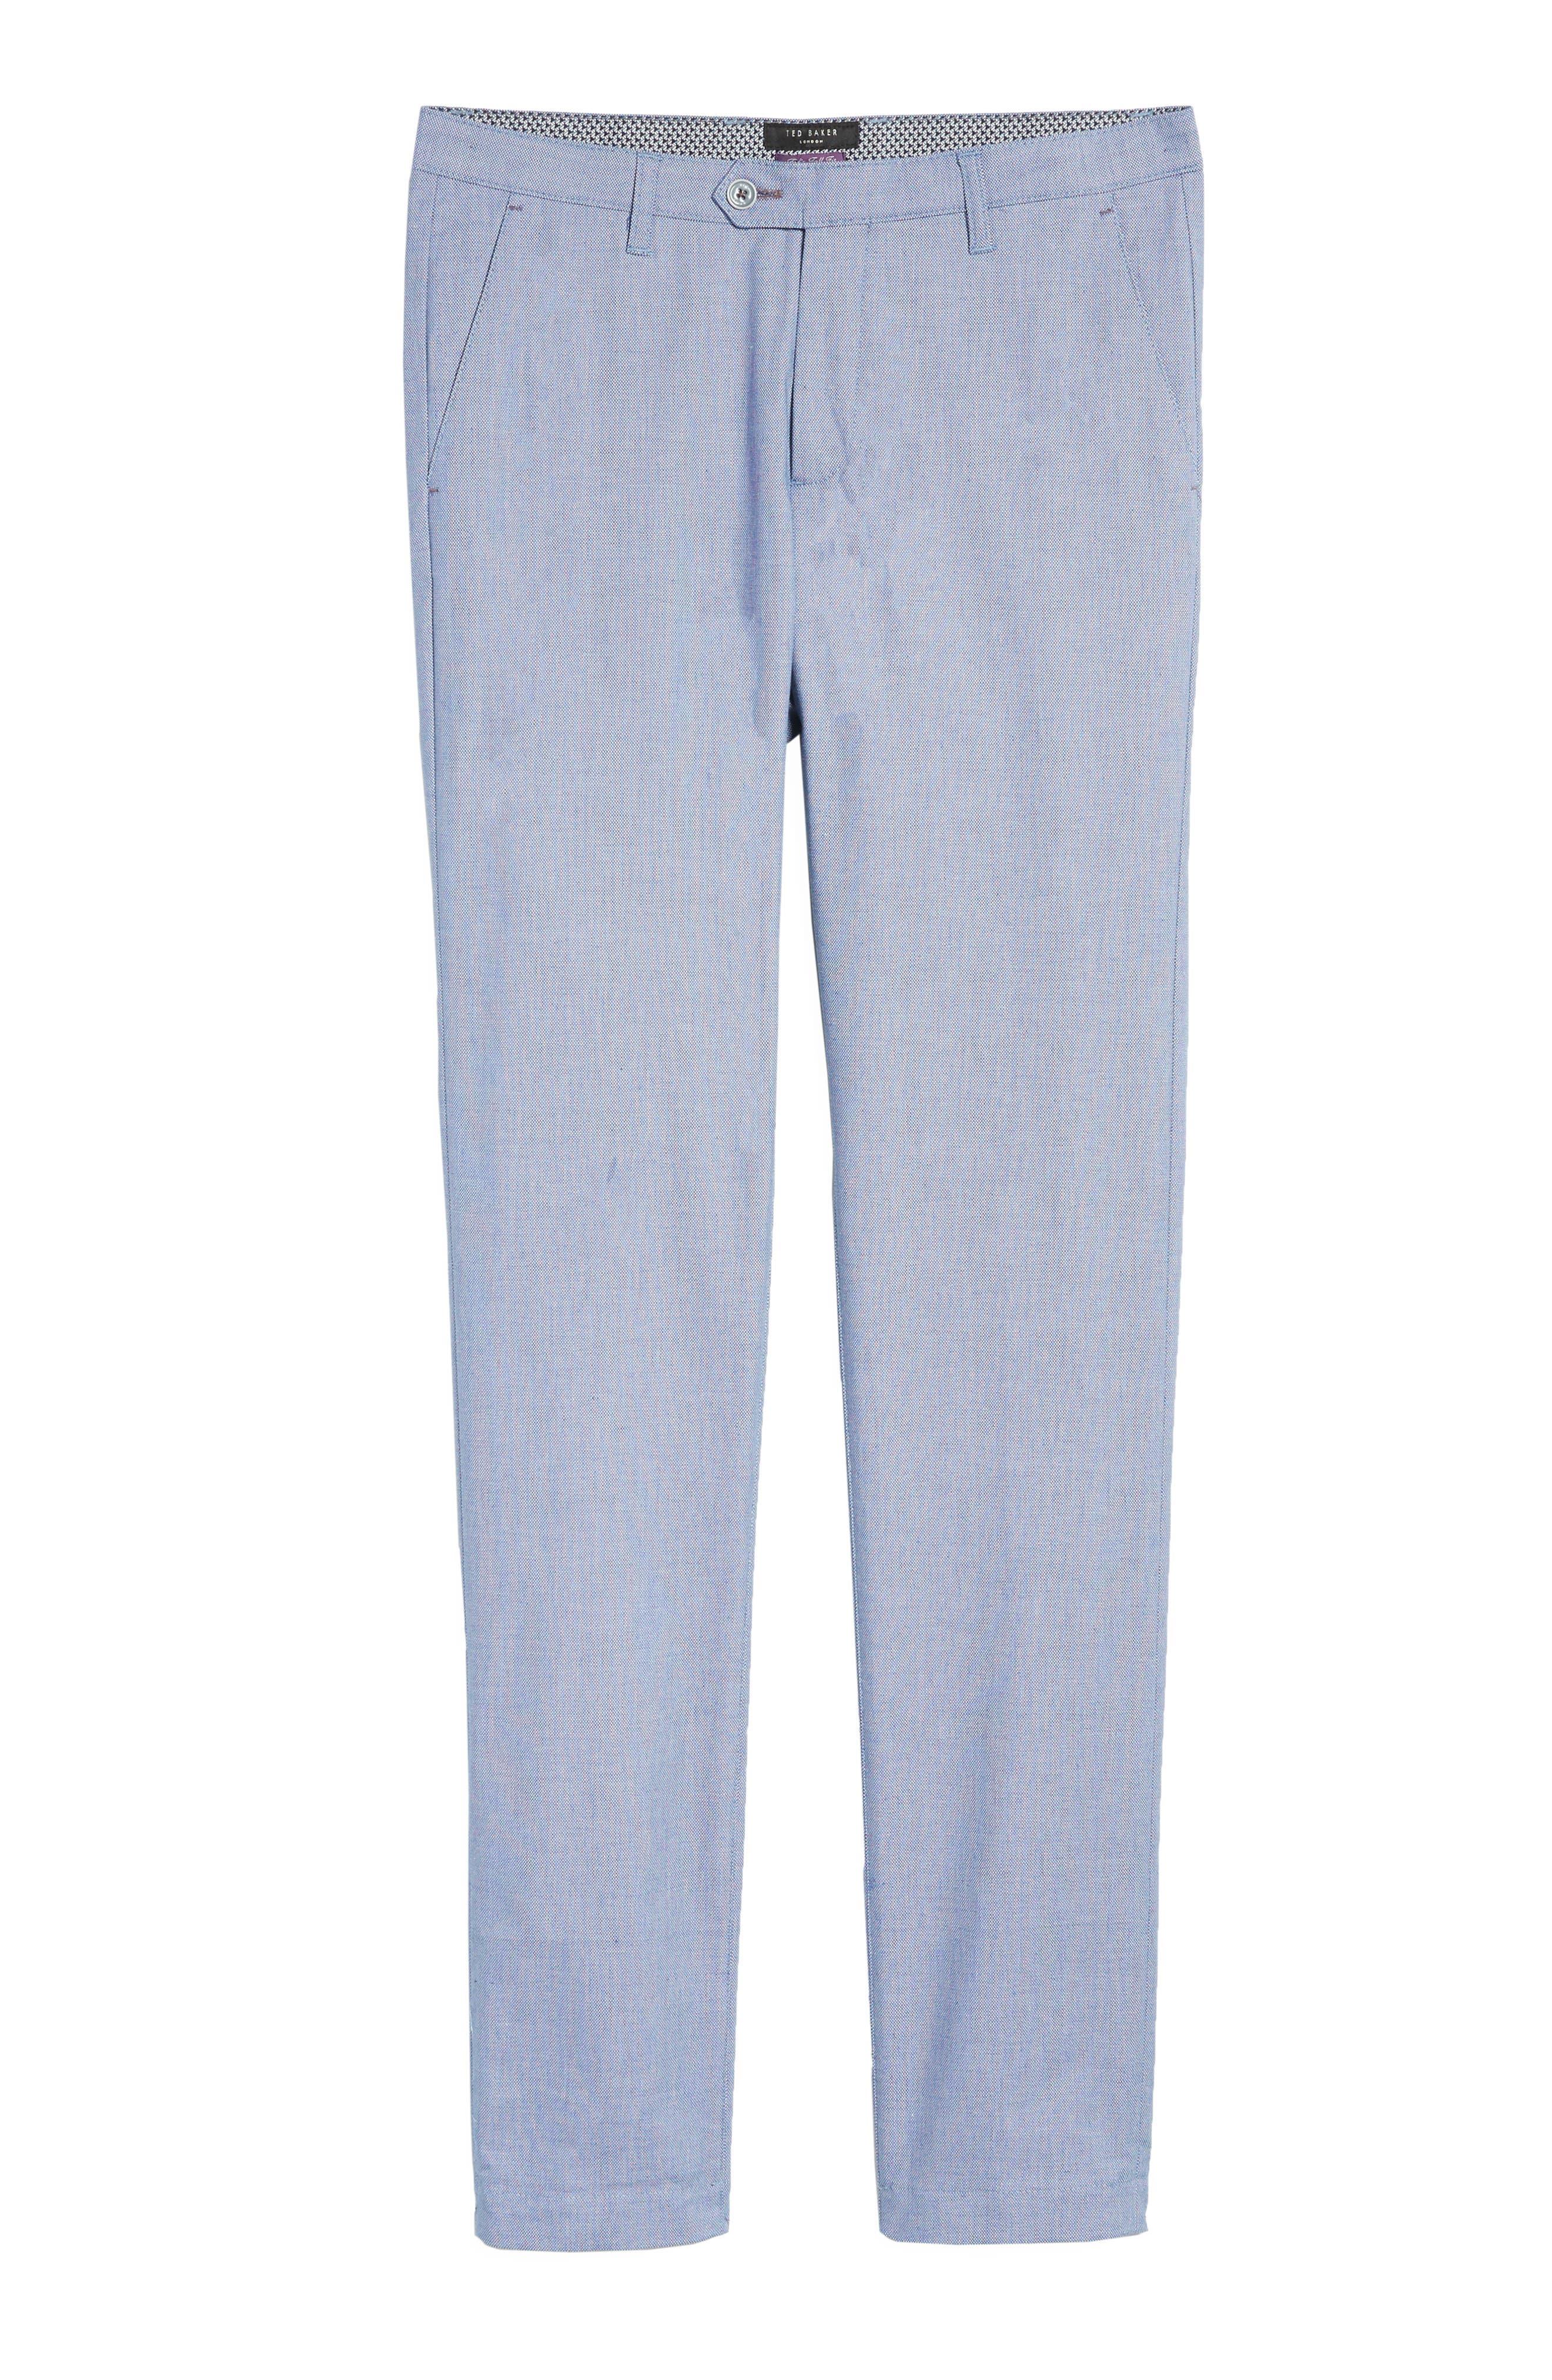 Holldet Flat Front Stretch Solid Cotton Pants,                             Alternate thumbnail 5, color,                             Light Blue